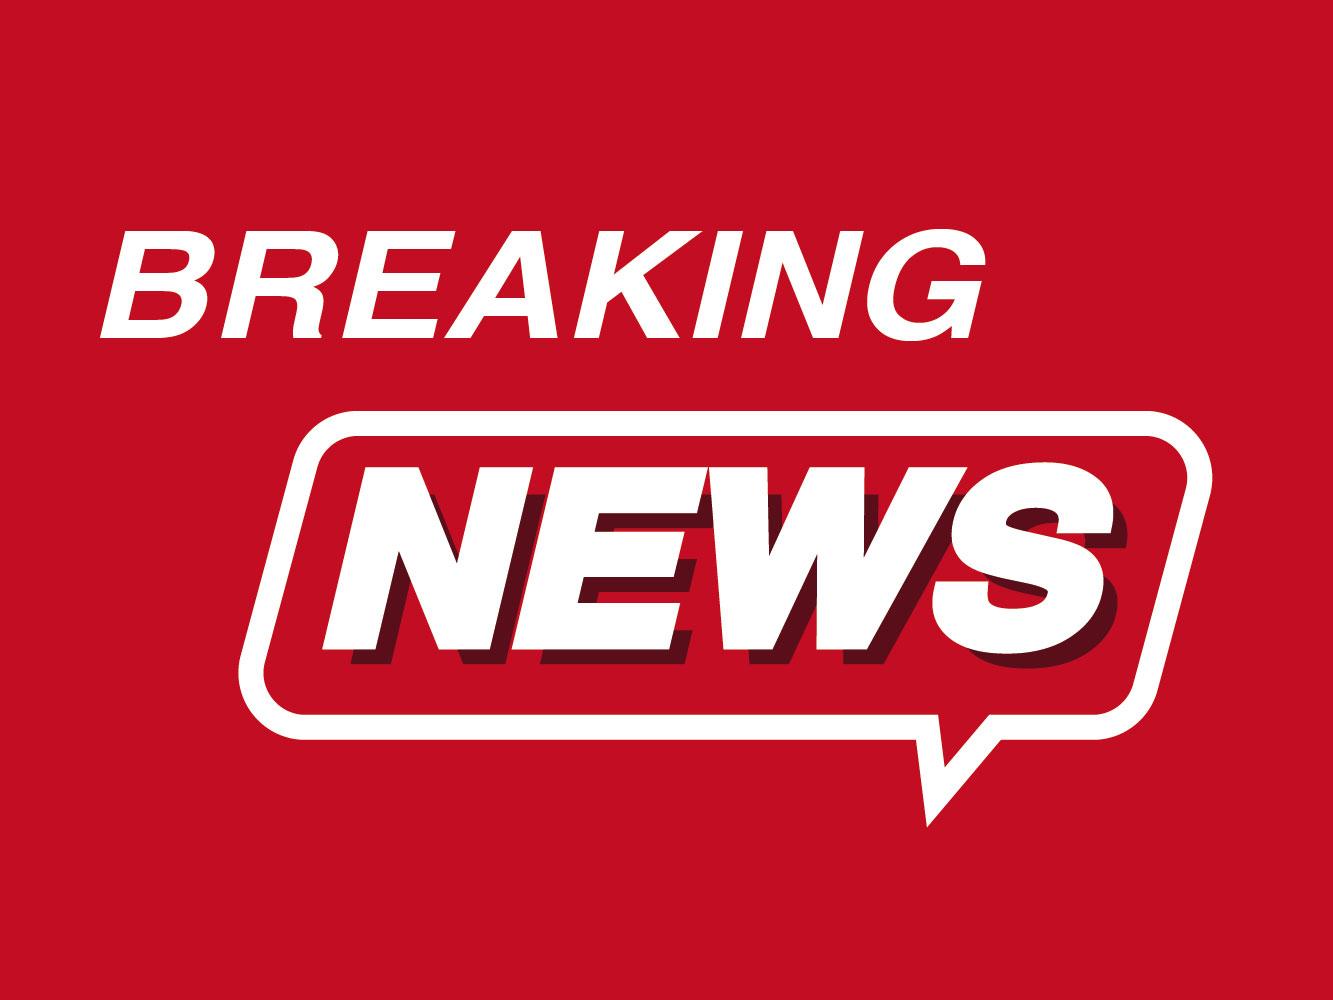 6.0-magnitude quake hits 76 km WNW of Isangel, Vanuatu -- USGS